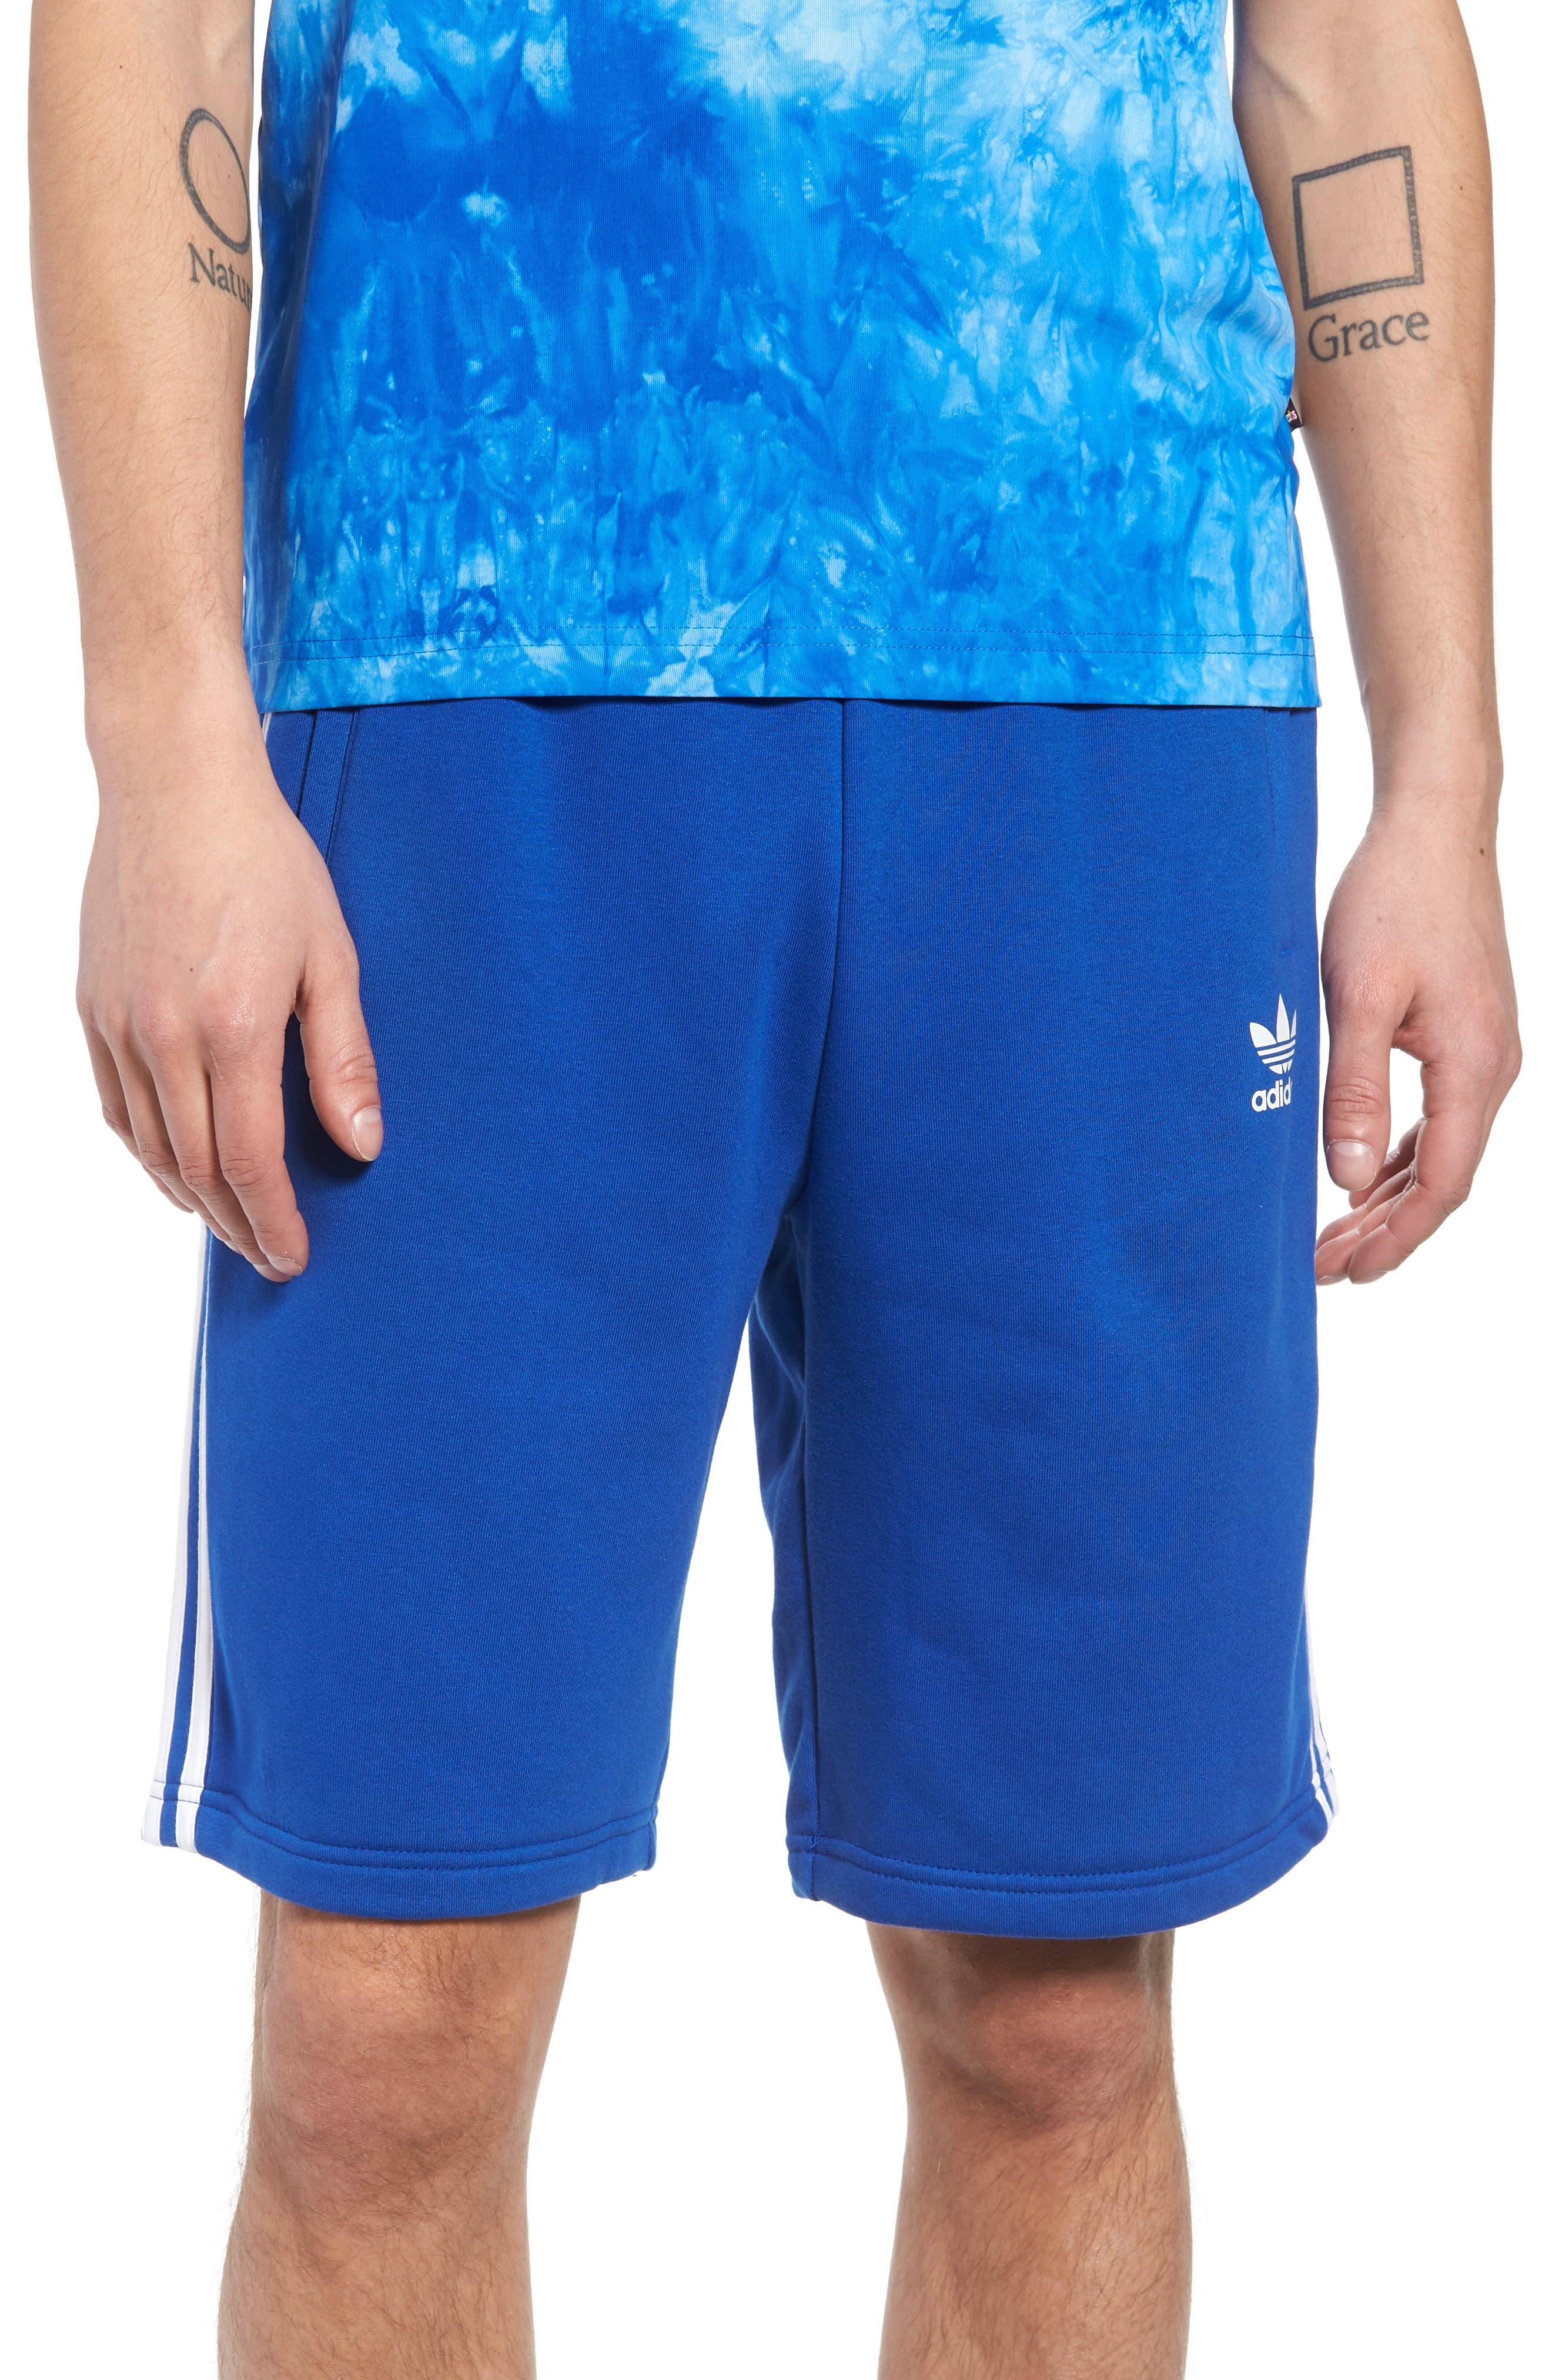 Main Image - adidas Originals 3-Stripes Shorts